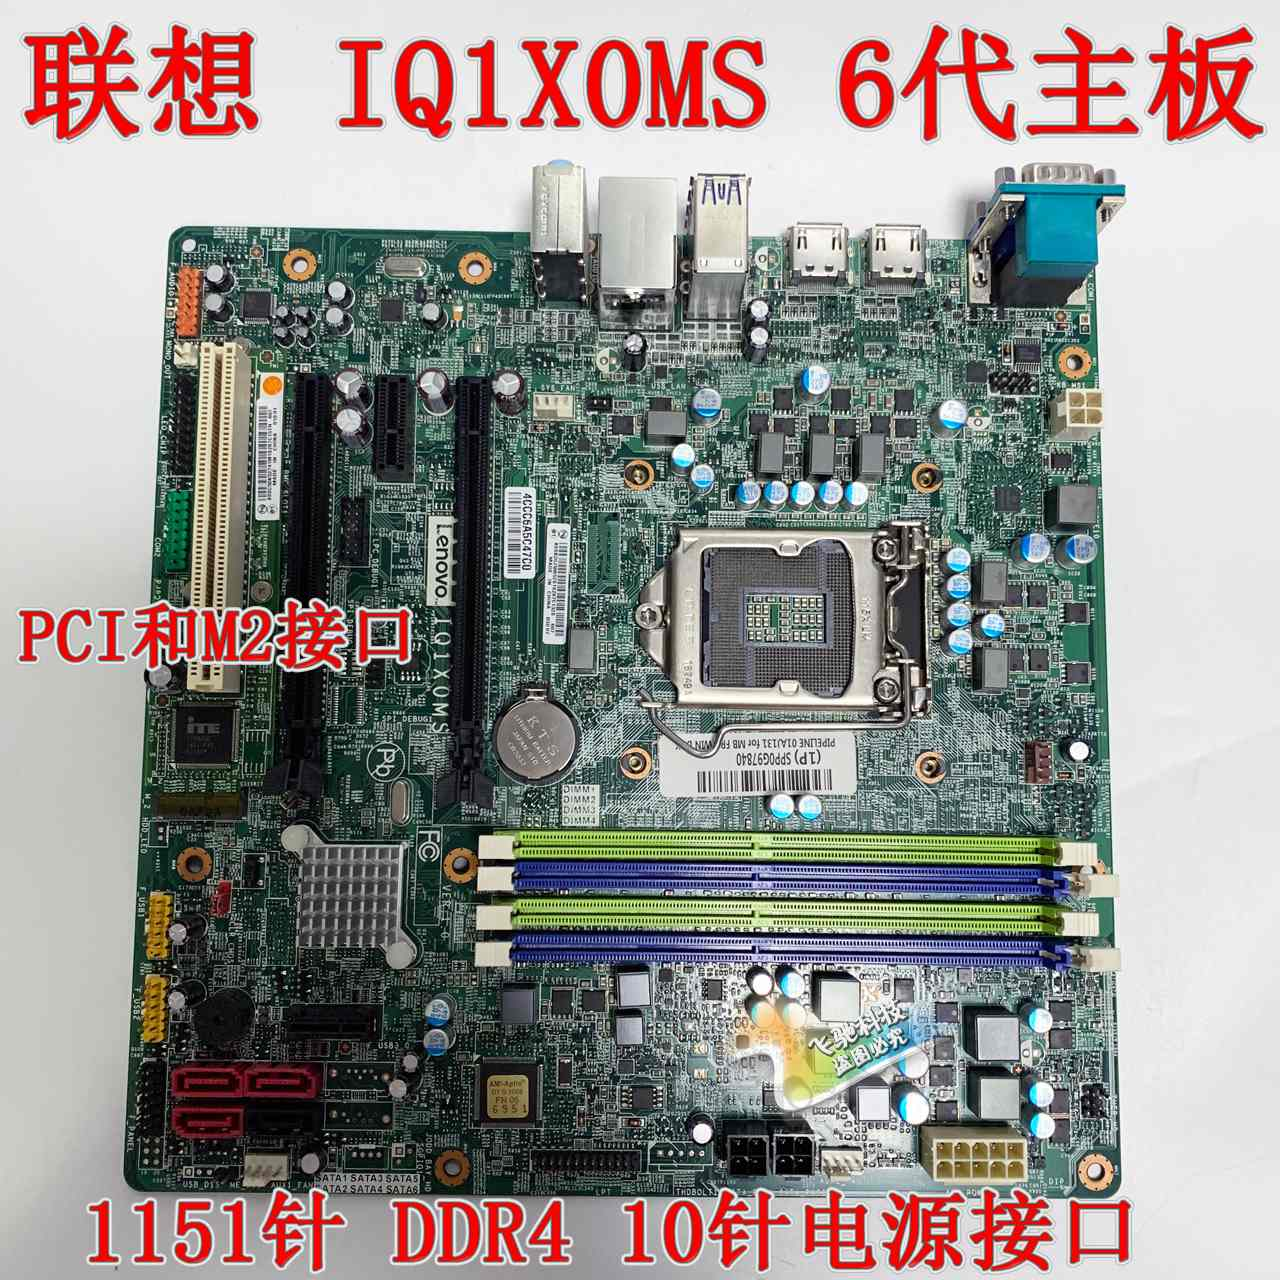 全新聯想M8600T M6600T M4600 IQ1X0MS Q150 Q170主機板M900 M800